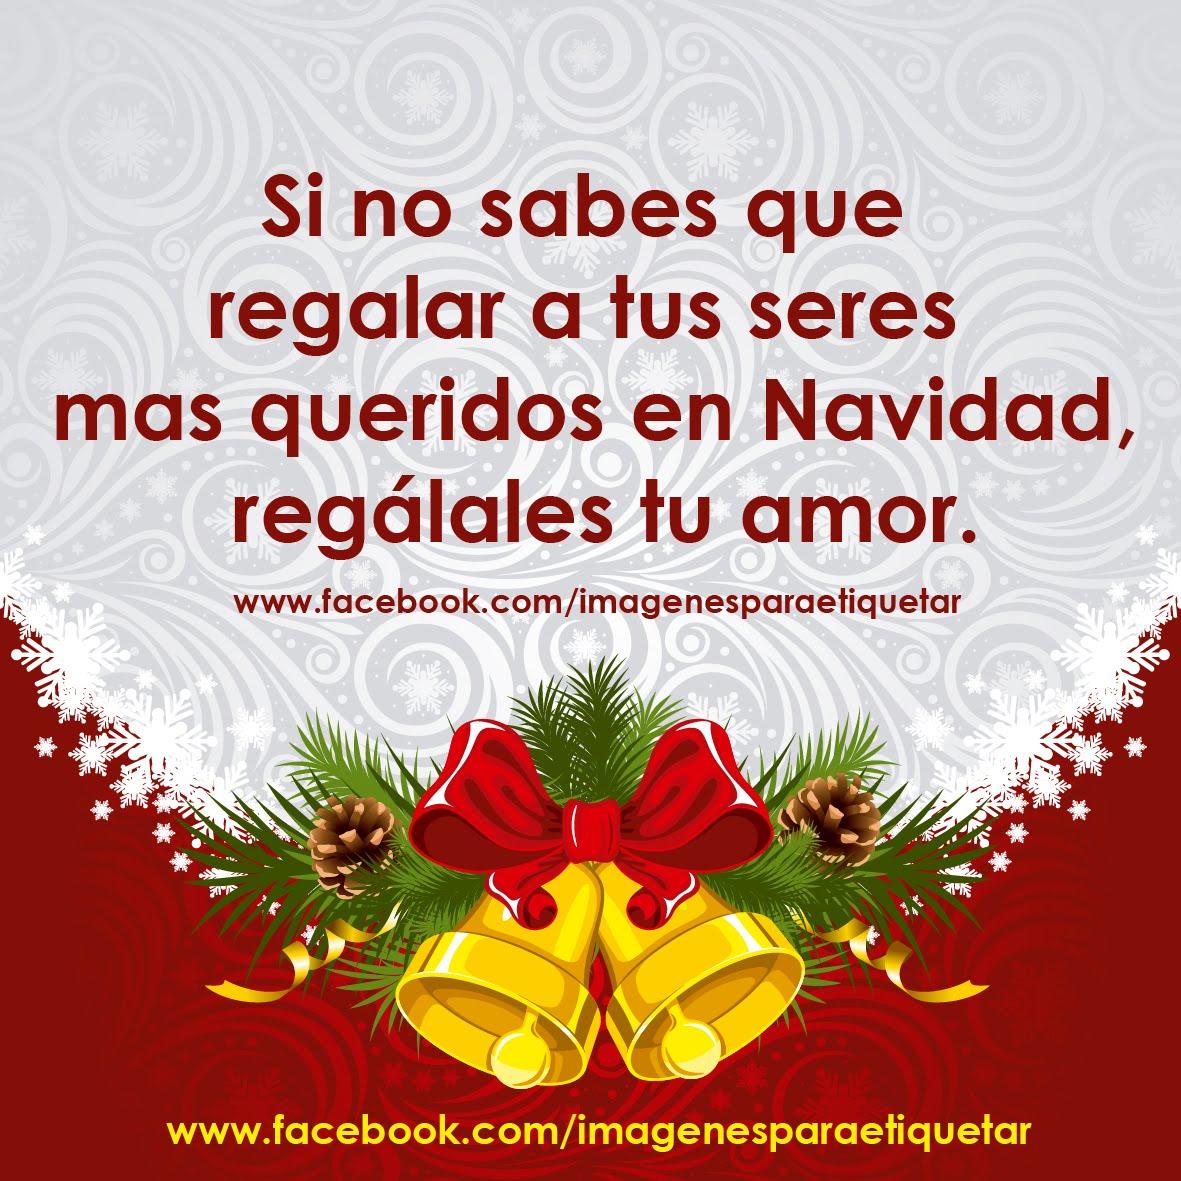 http://1.bp.blogspot.com/-IEVyQGtNbrw/TugotVgl90I/AAAAAAAAKOY/57xXH99Dz3g/s1600/Frases+Navidad+sobre+el+amor+en+Facebook.jpg